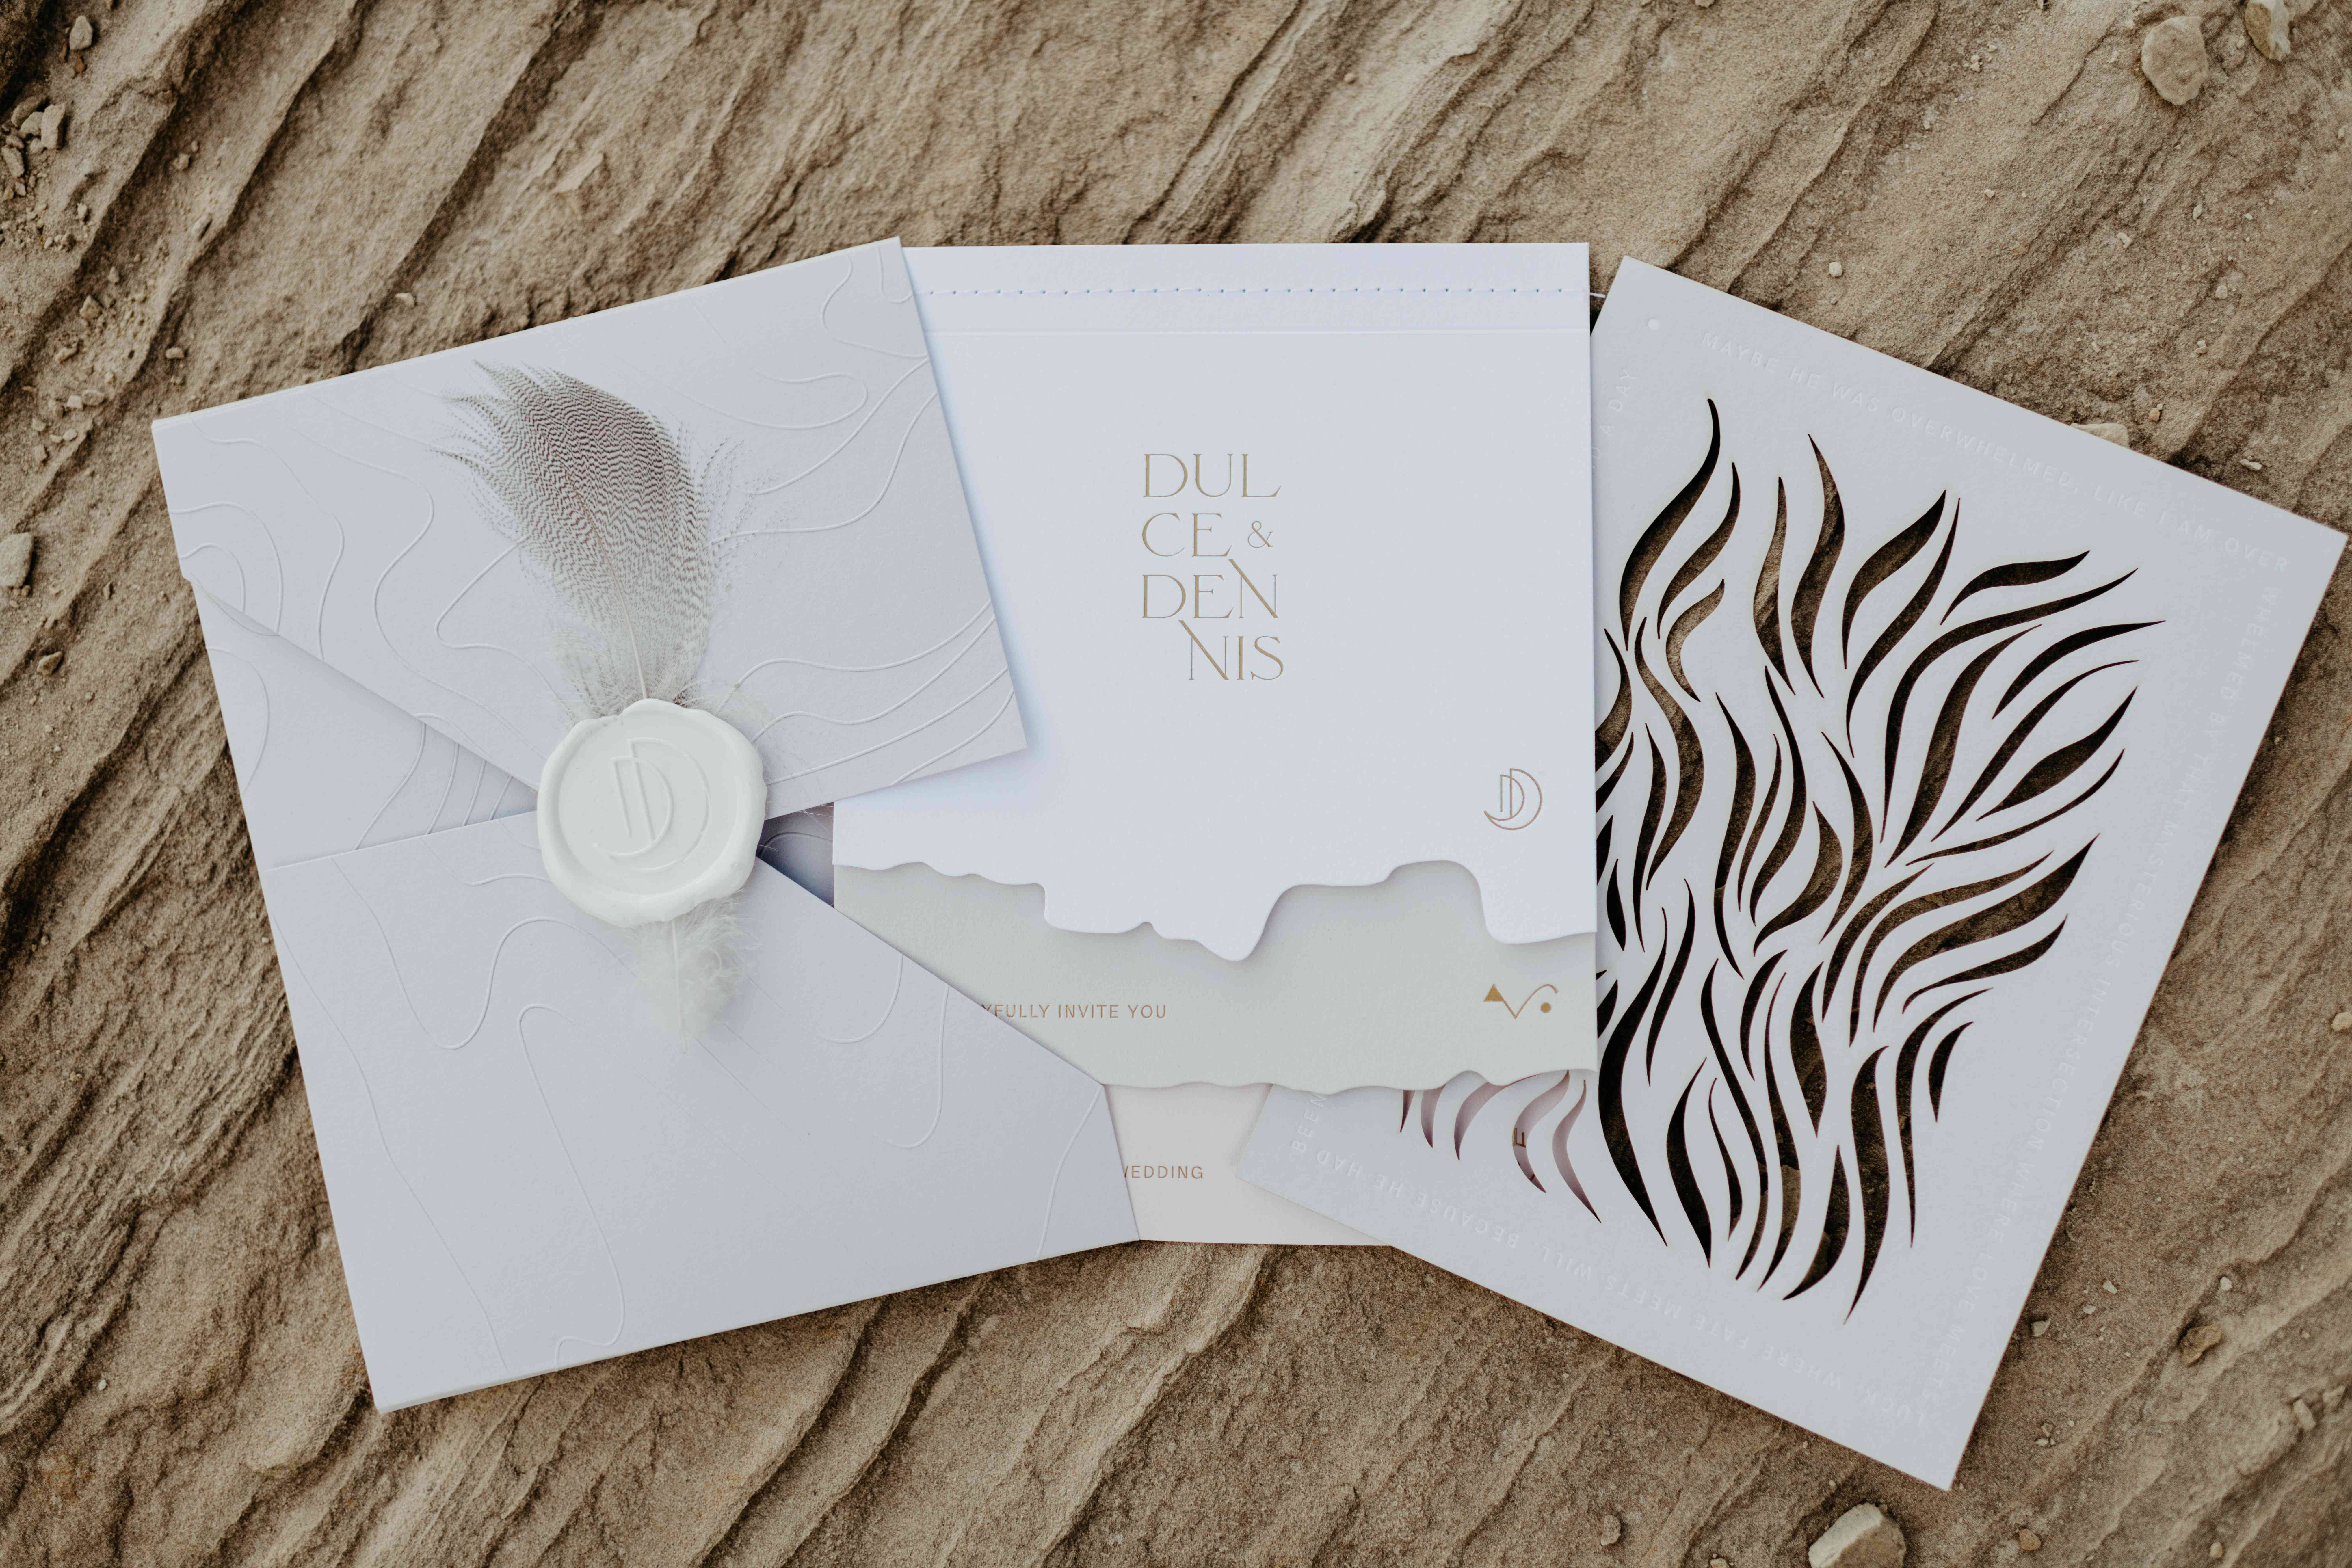 Invitation with wax seal